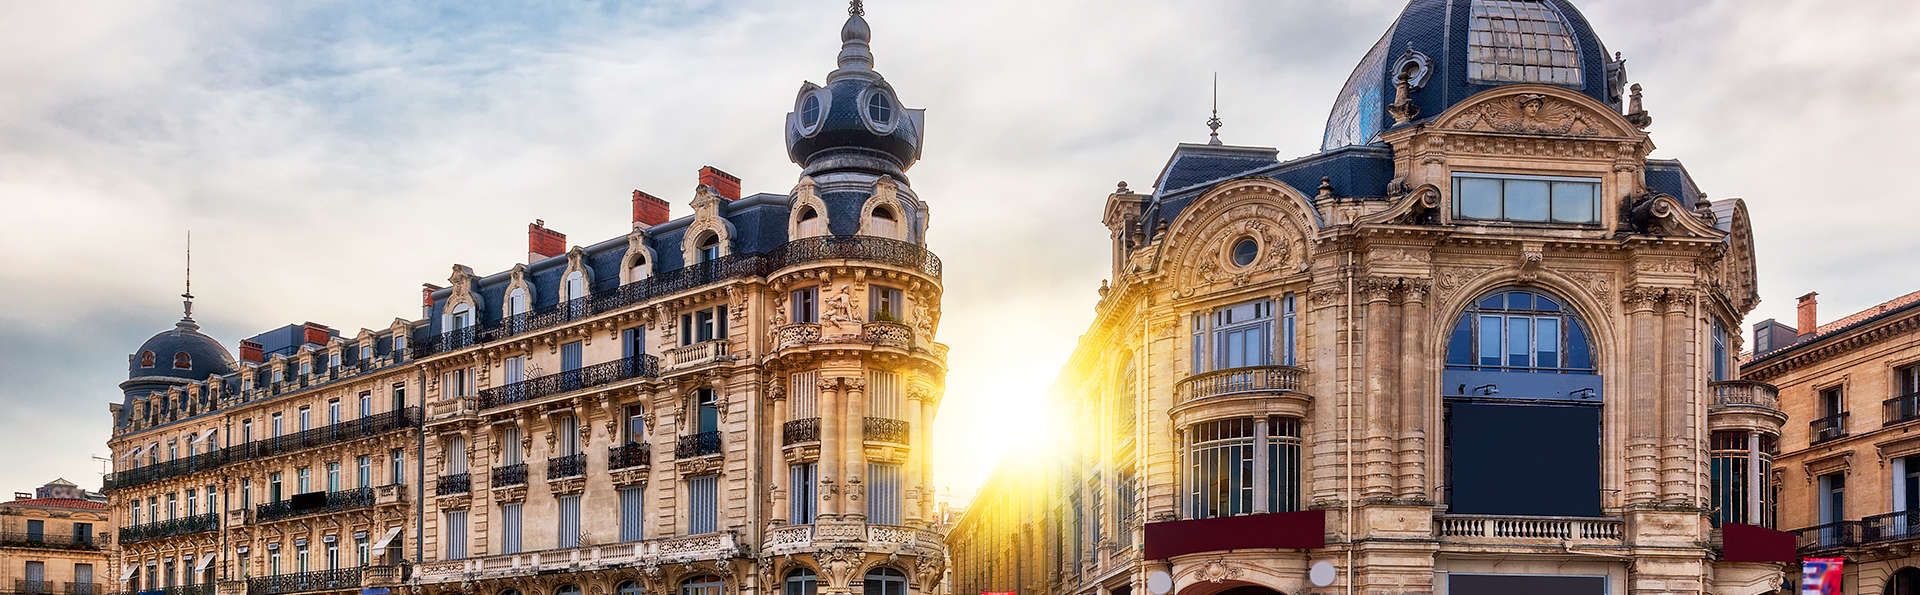 Appart'hôtel Odalys Les Occitanes - EDIT_Montpellier2.jpg